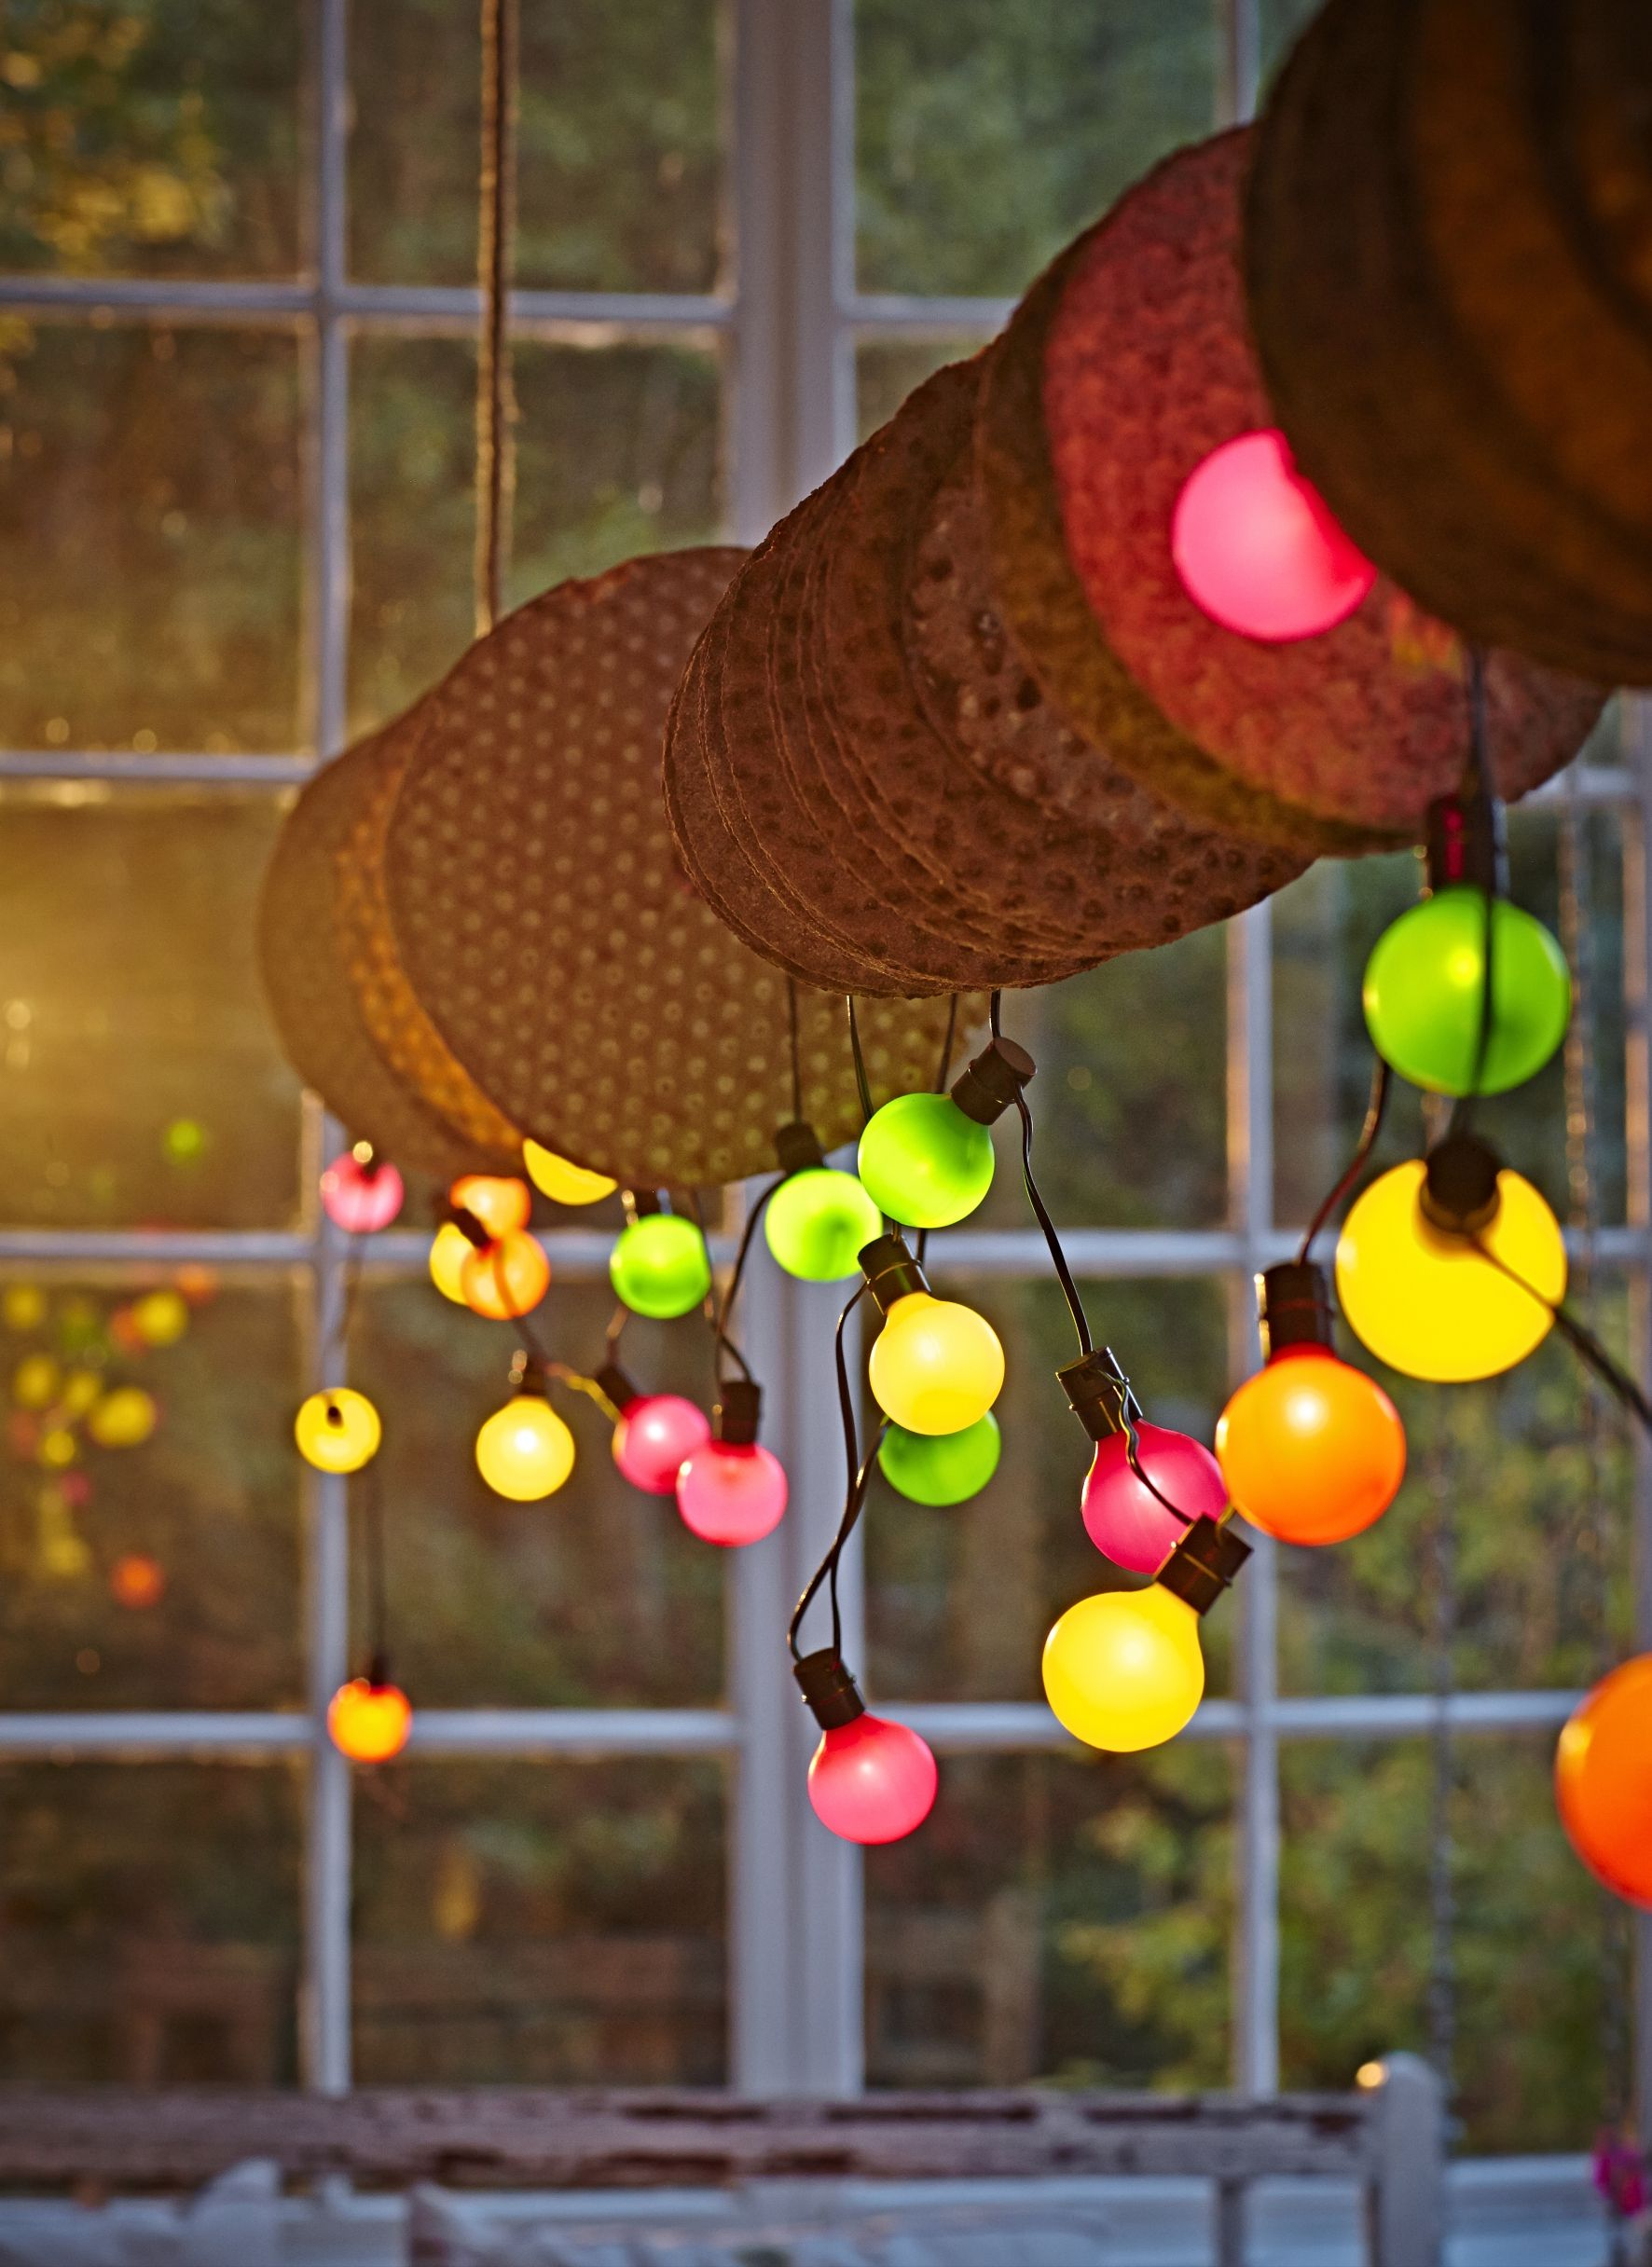 guirlandes nergie solaire solvinden ikea deco design decorando pinterest bureaus and. Black Bedroom Furniture Sets. Home Design Ideas